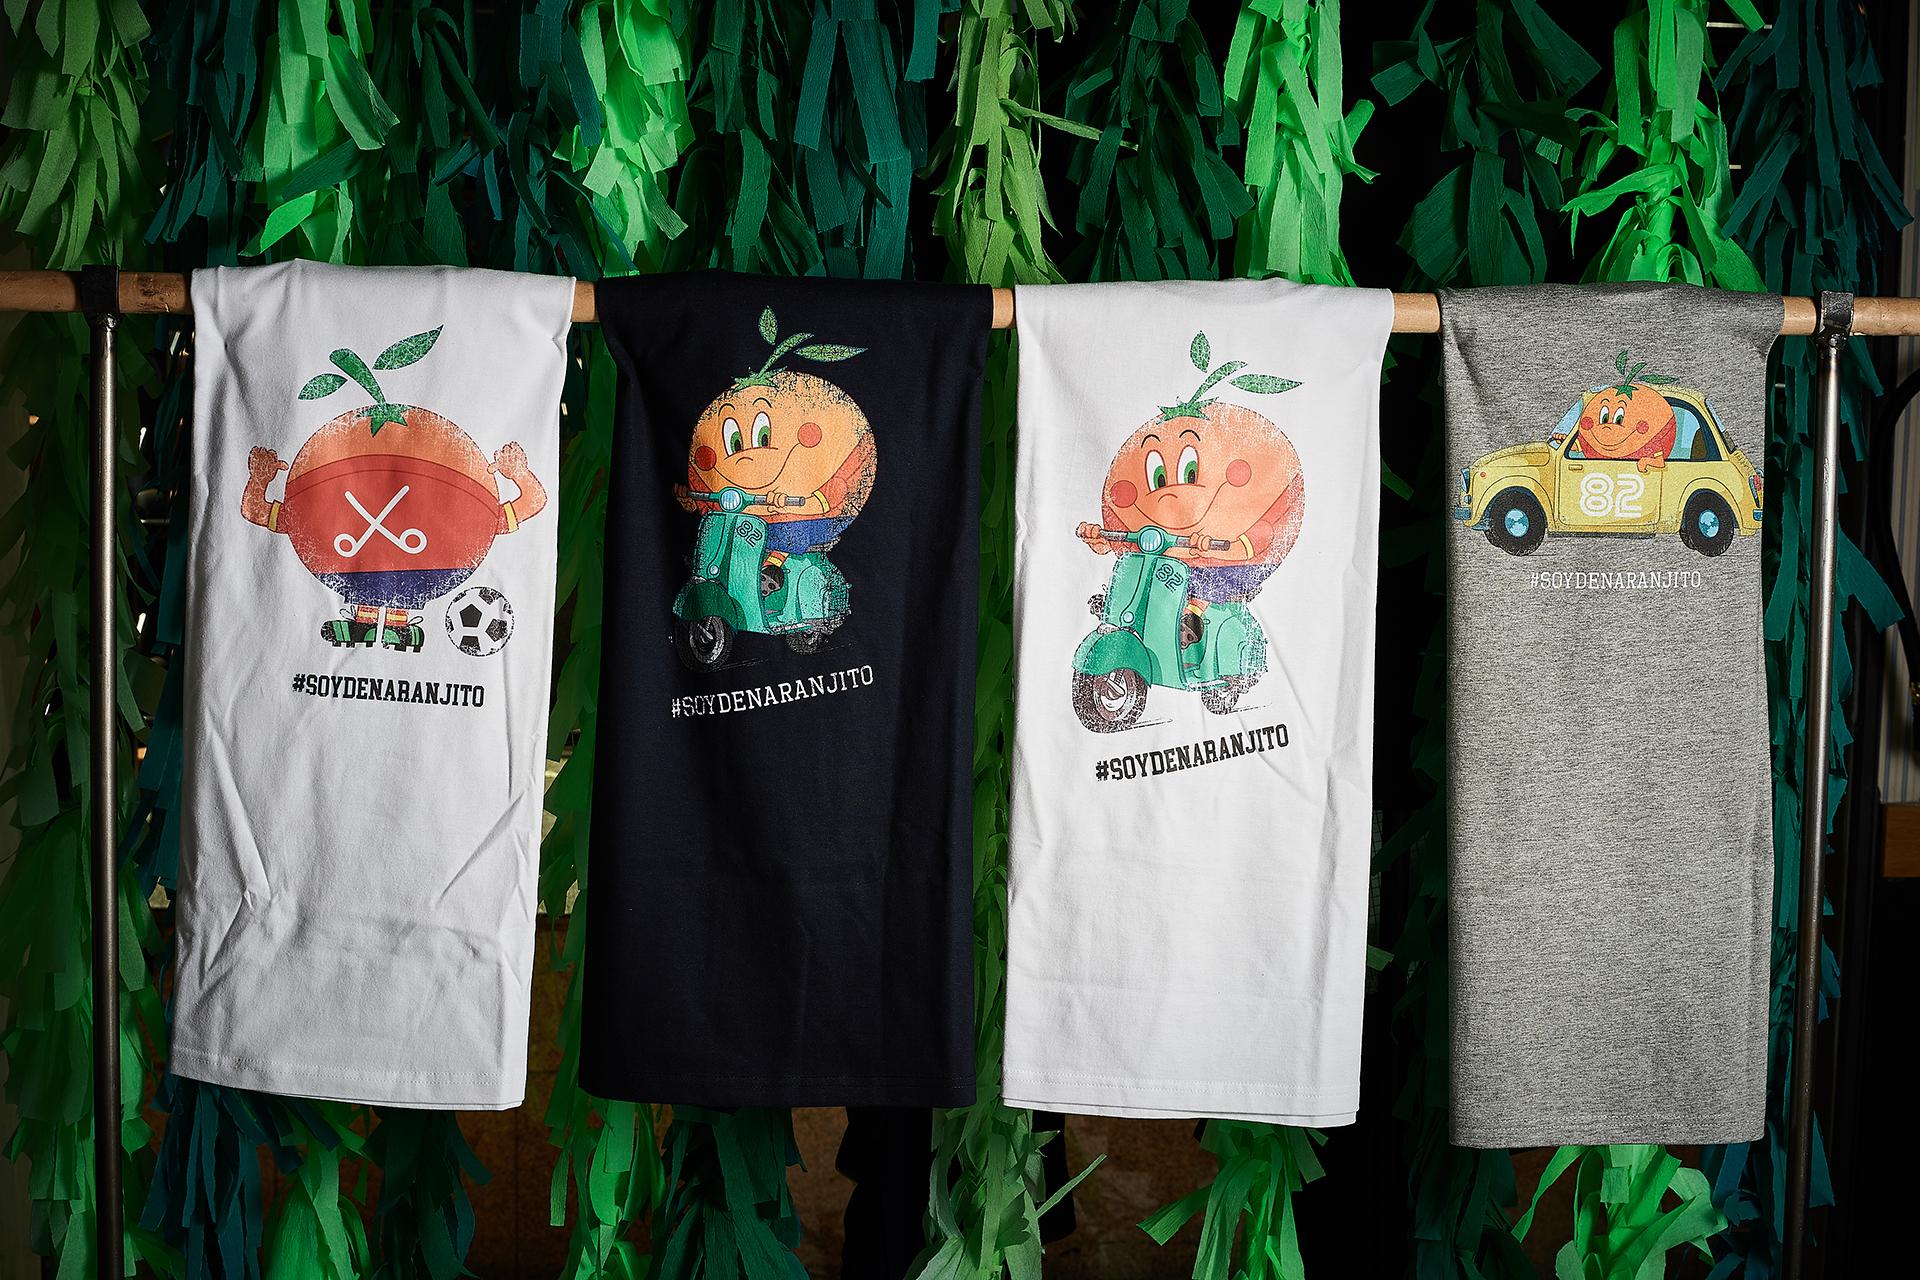 mundial 1982 naranjito